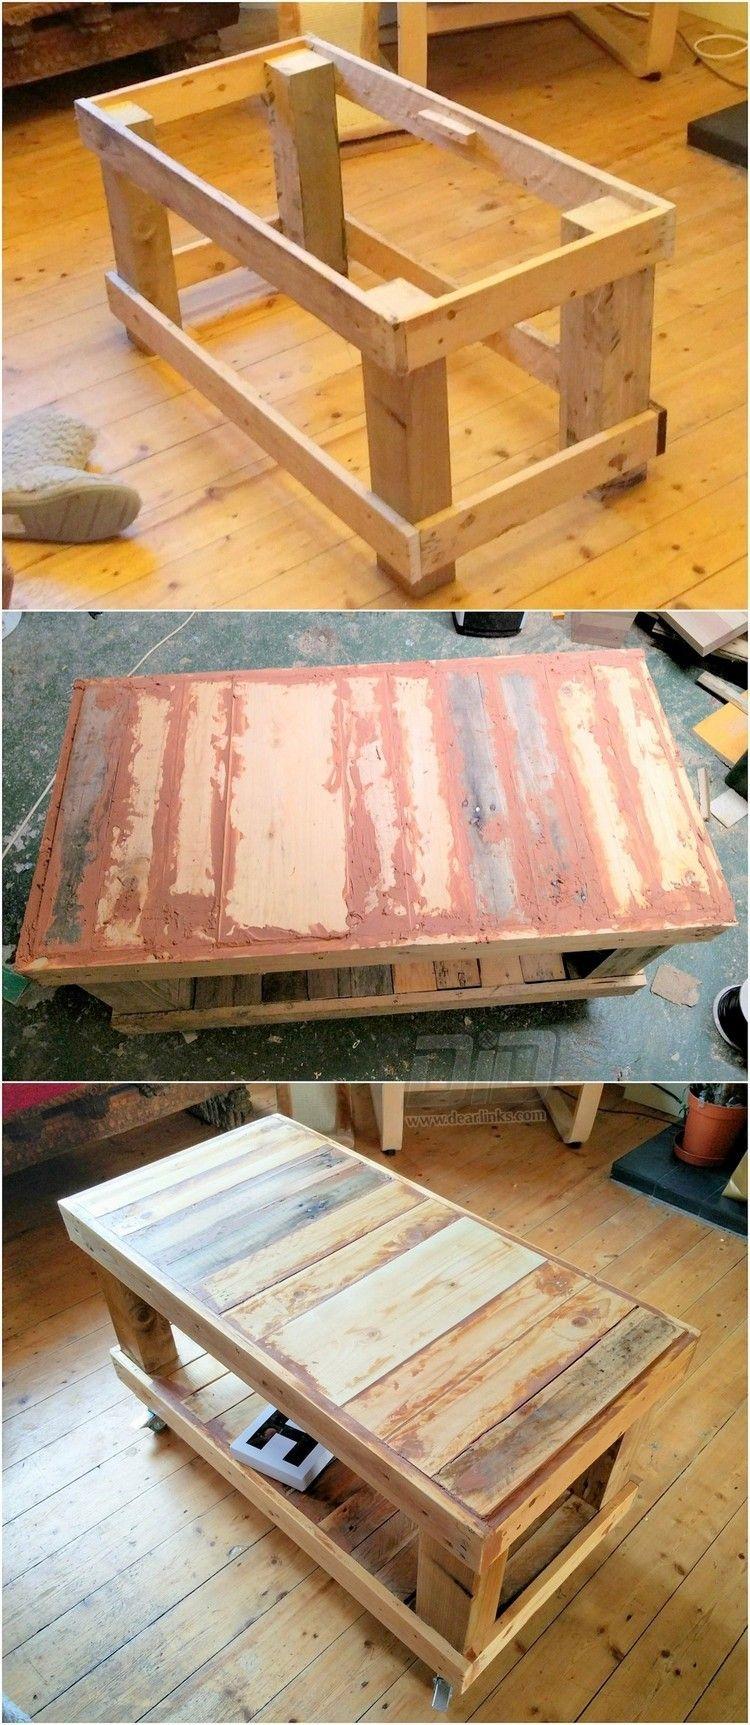 Reclaimed Pallet Wood Coffee Table Idea Pallet Wood Coffee Table Coffee Table Wood Reclaimed Pallet Wood [ 1725 x 750 Pixel ]